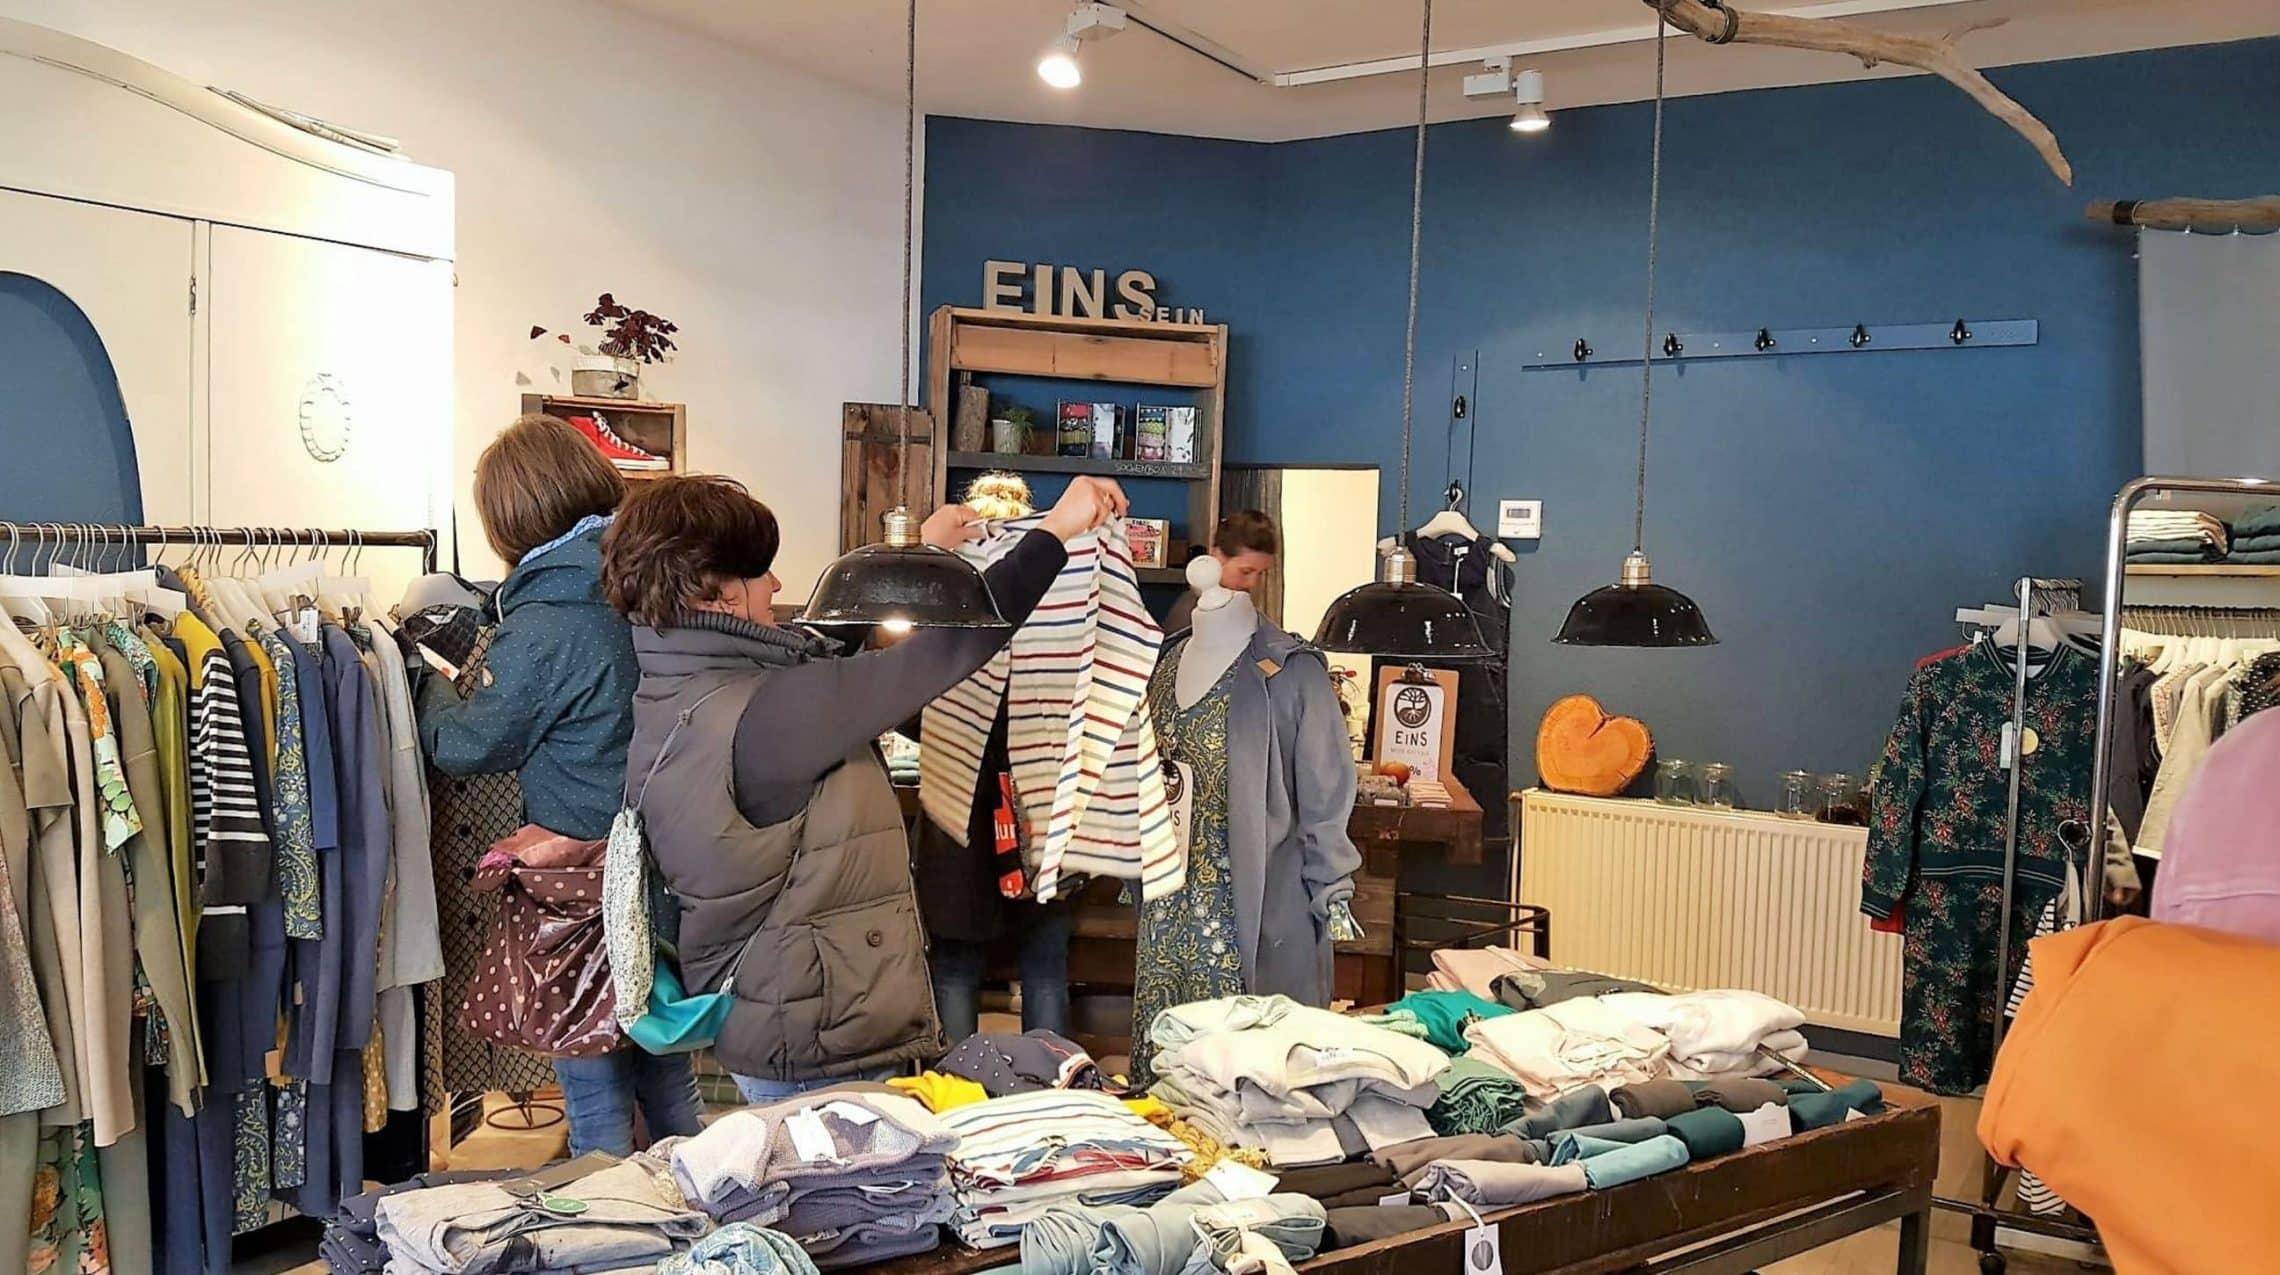 style hannover eins 3 - EINS - Mode bio & fair